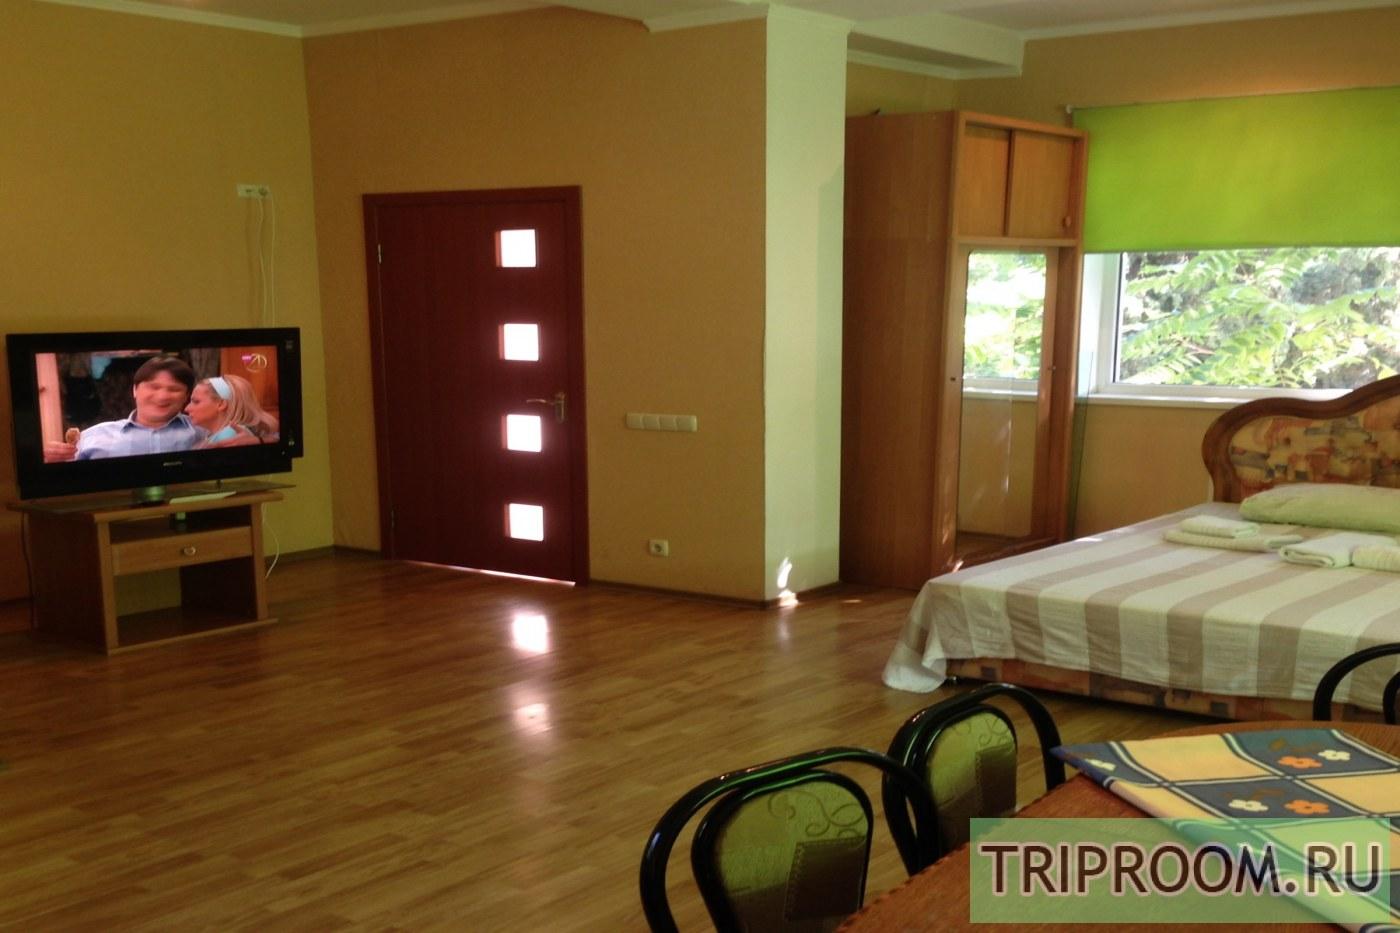 1-комнатная квартира посуточно (вариант № 23289), ул. Кирова улица, фото № 5